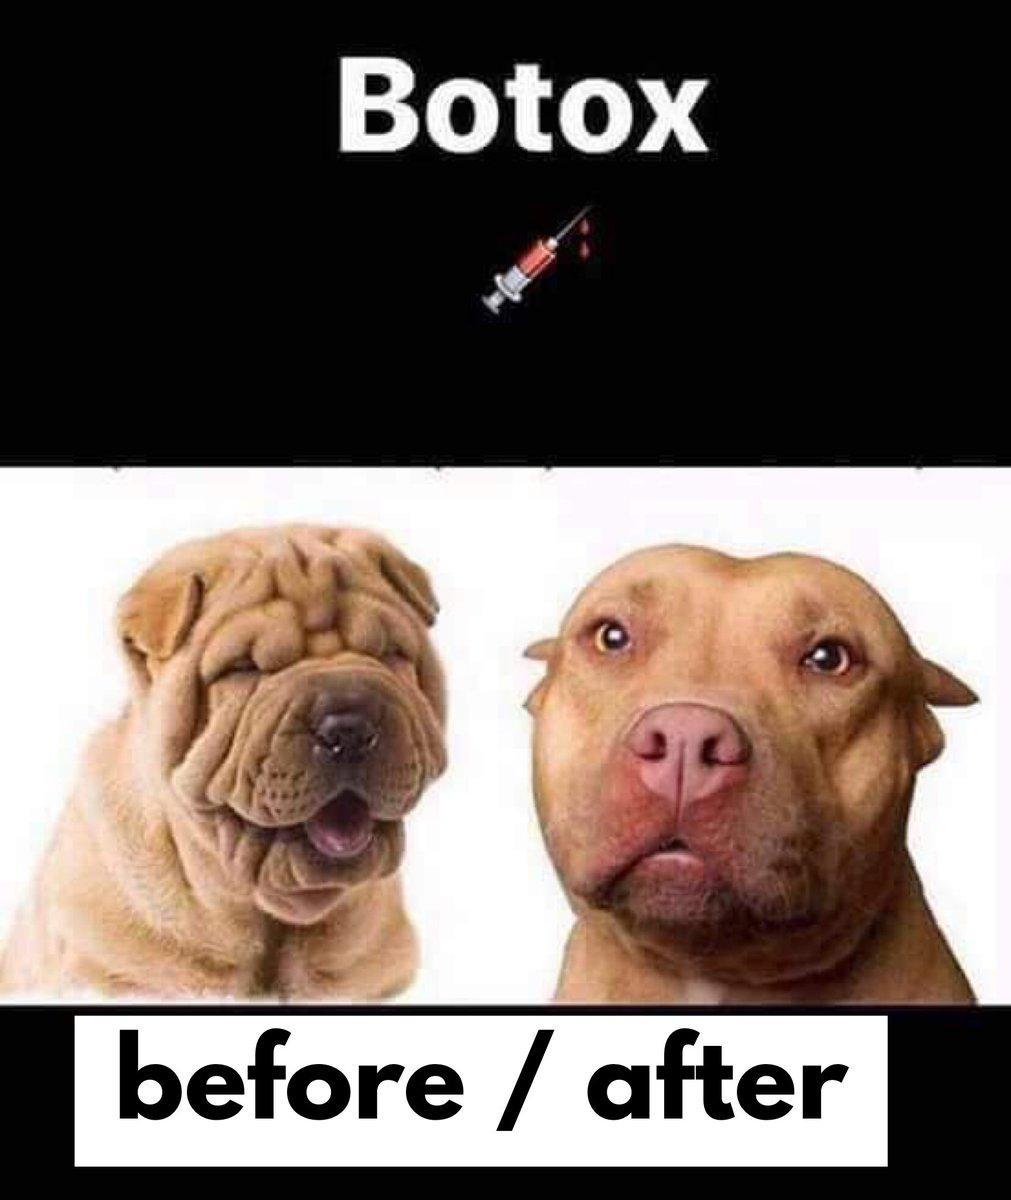 Botox  #botox #botoxday #sinarrugas #antiage #humor #memedeldíapic.twitter.com/49HVd332rv